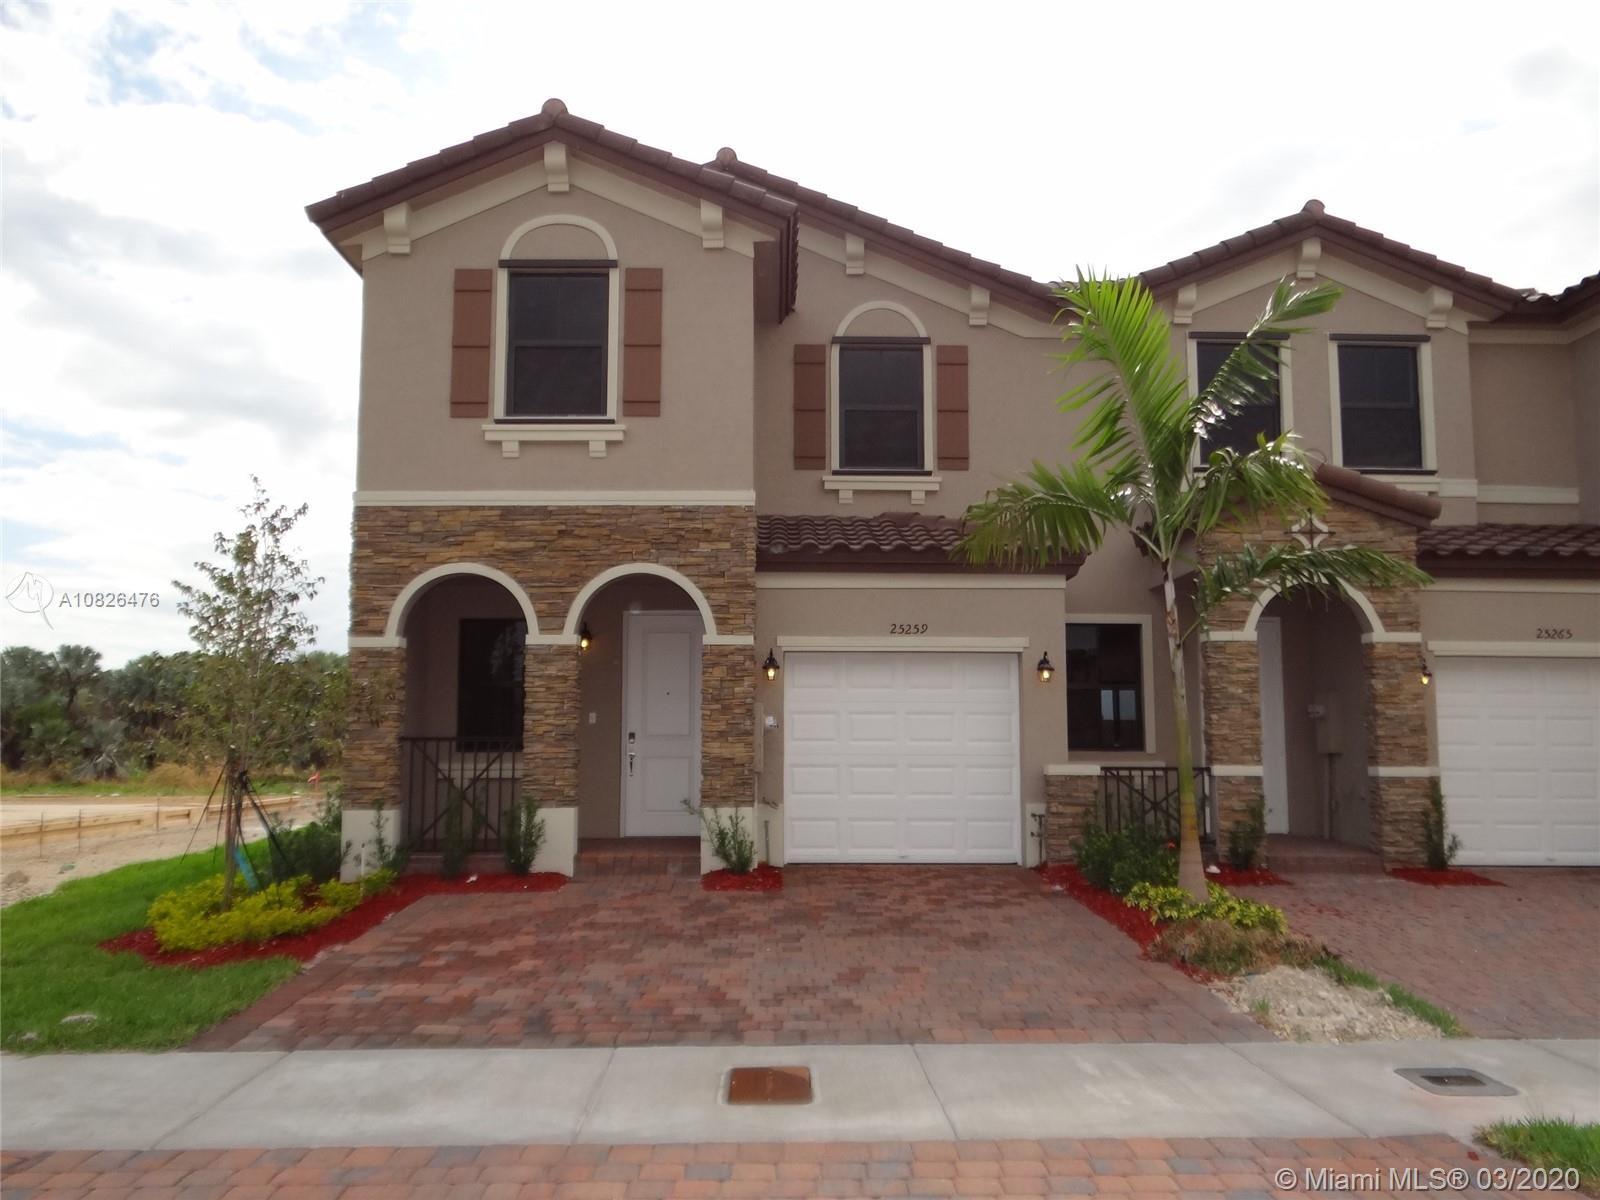 25259 SW 114th Ct, Homestead, FL 33032 - Homestead, FL real estate listing